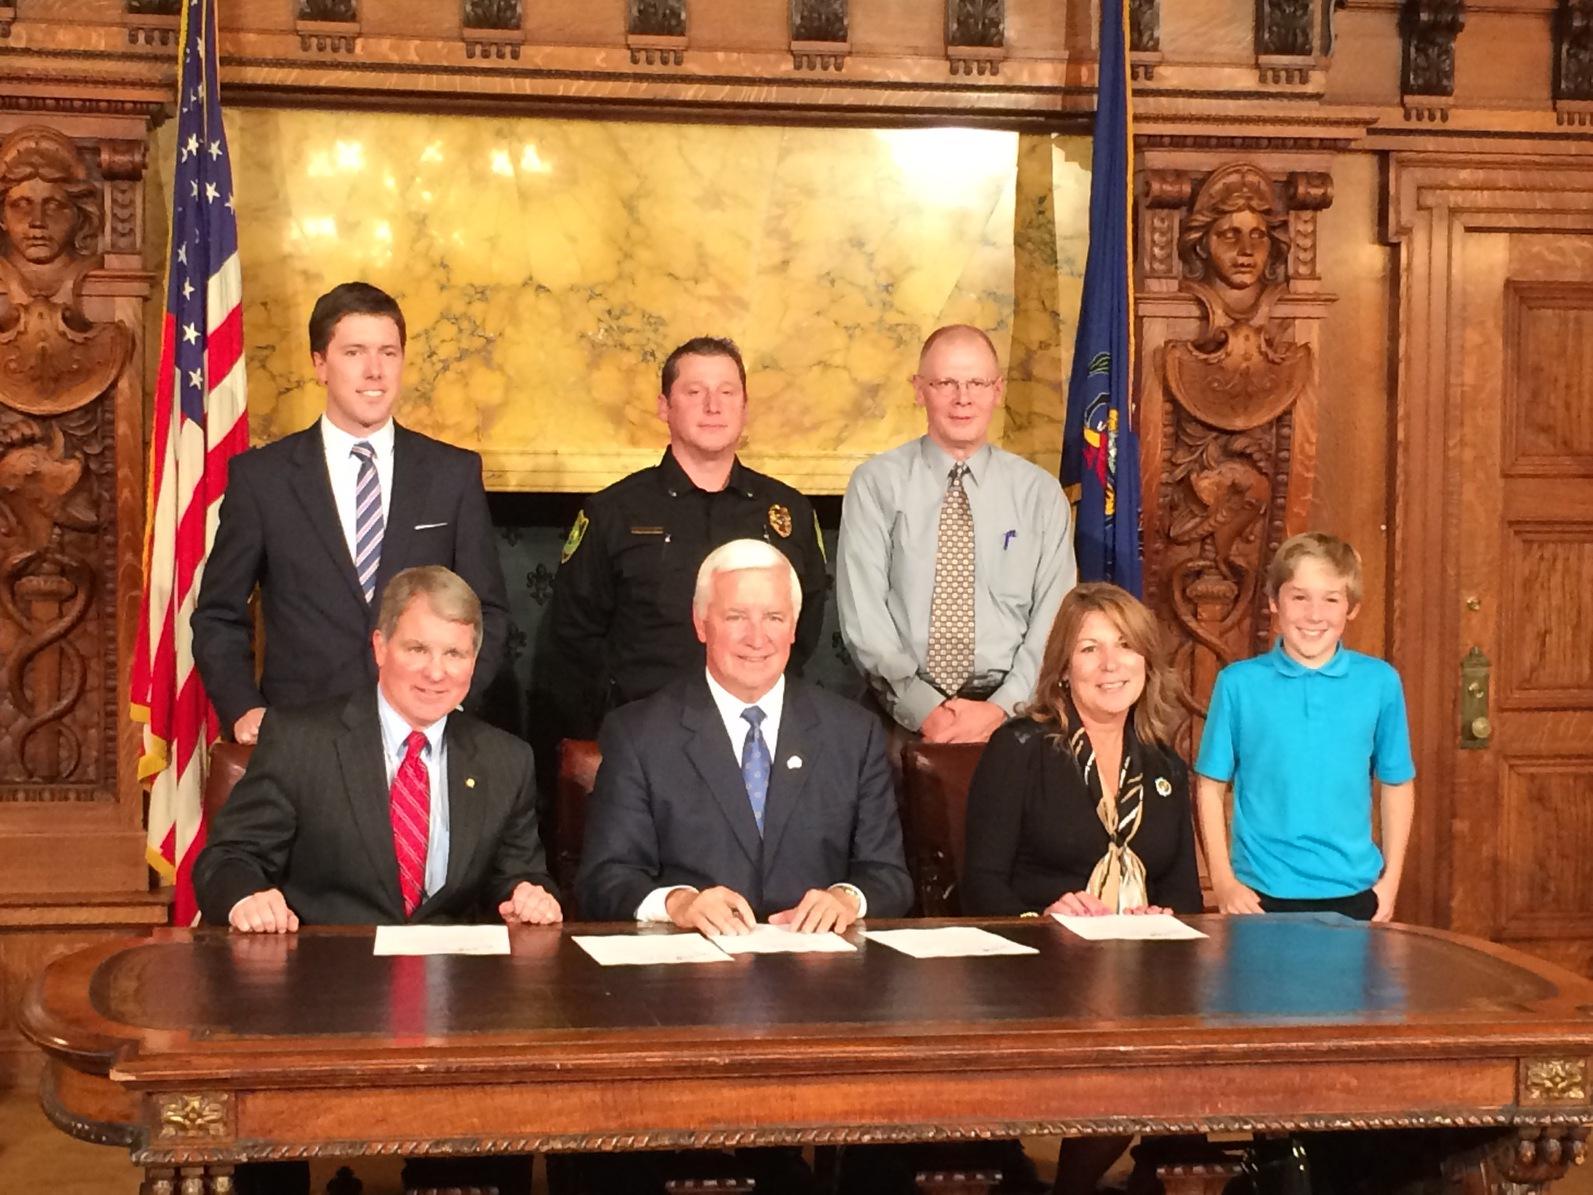 Standing from left to right is Jon Hopcraft. Lt. Matthew Johnson, David Johnson, Adyson Johnson  Sitting from left to right is Senator David Argall, Governor Tom Corbett, Representative Tina Davis.